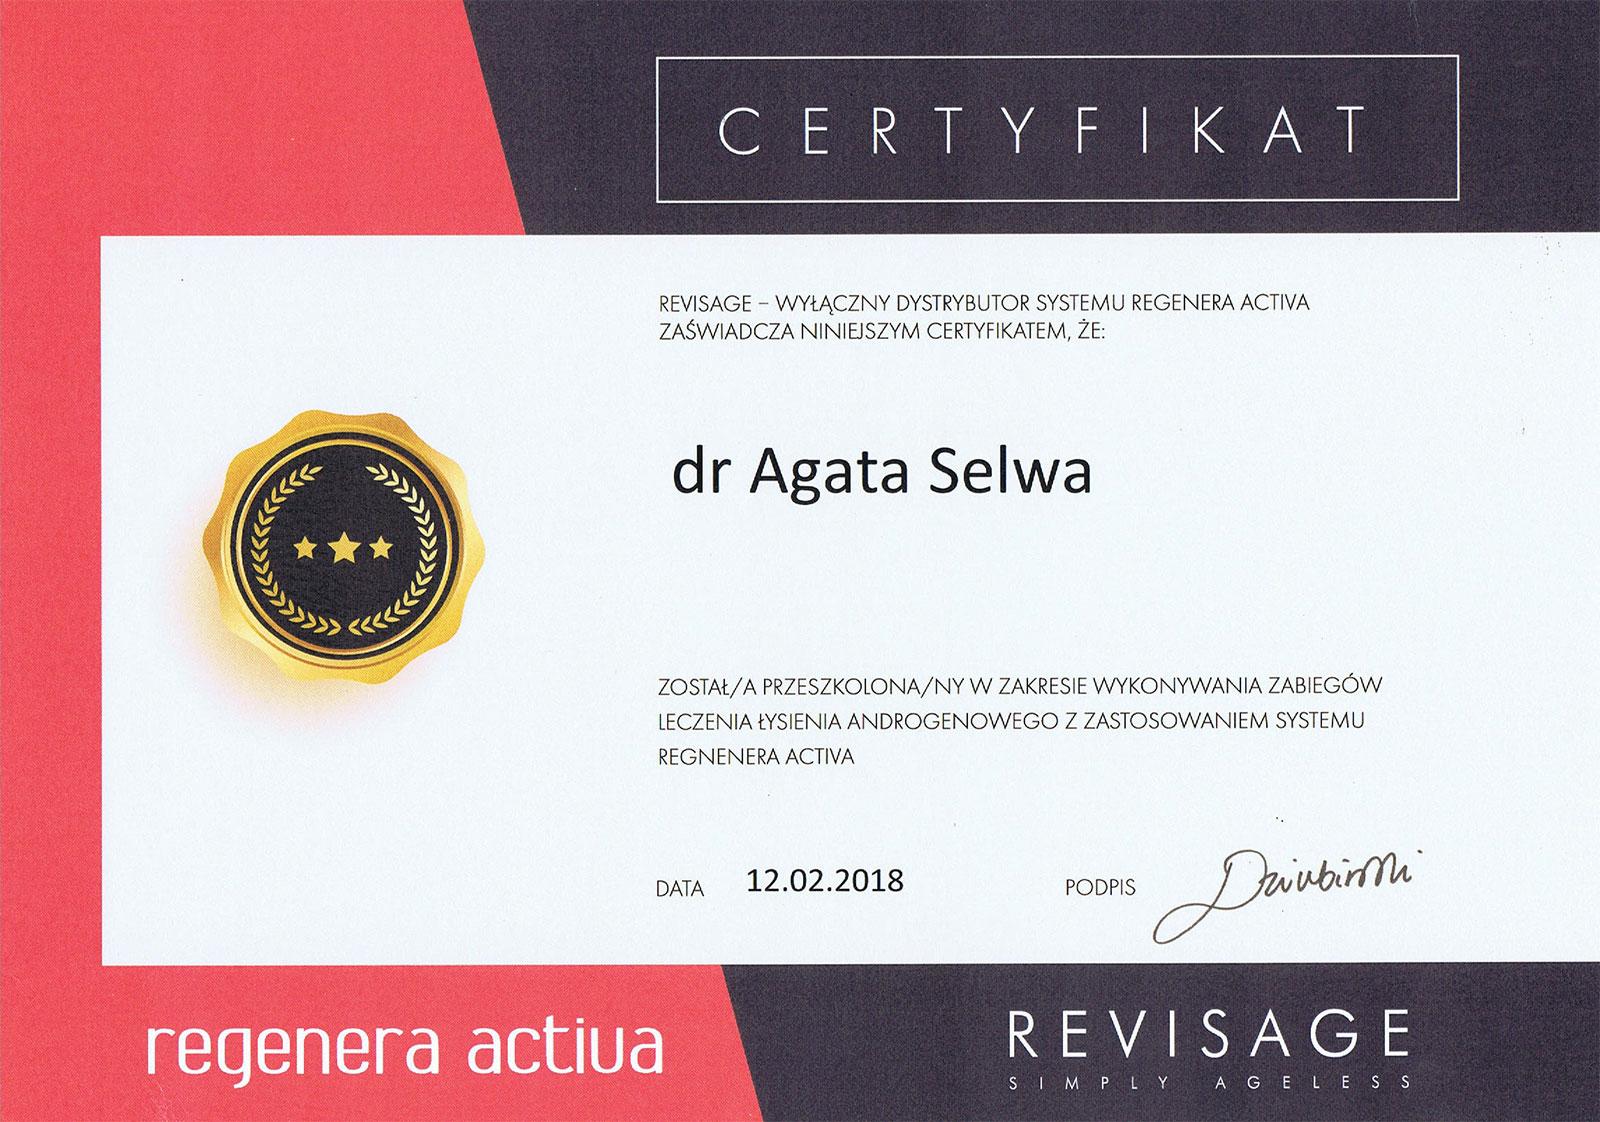 certyfikat revisage - O MNIE